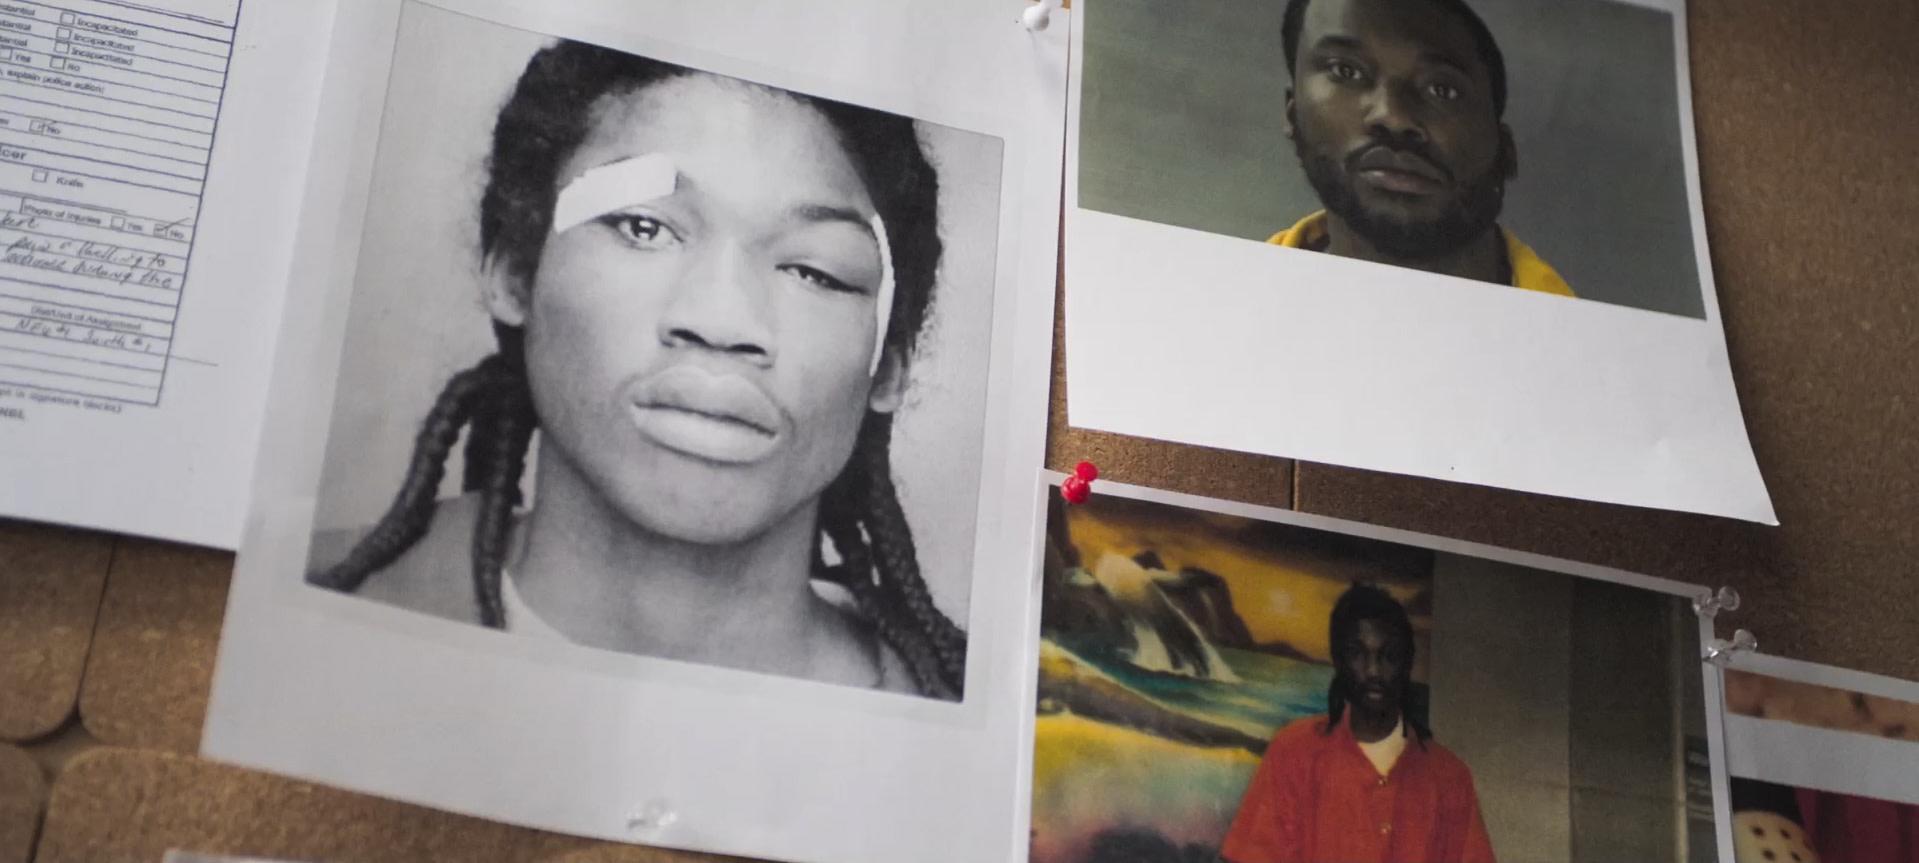 Meet the 'Free Meek' Investigator Who Helped Overturn Meek Mill's Conviction